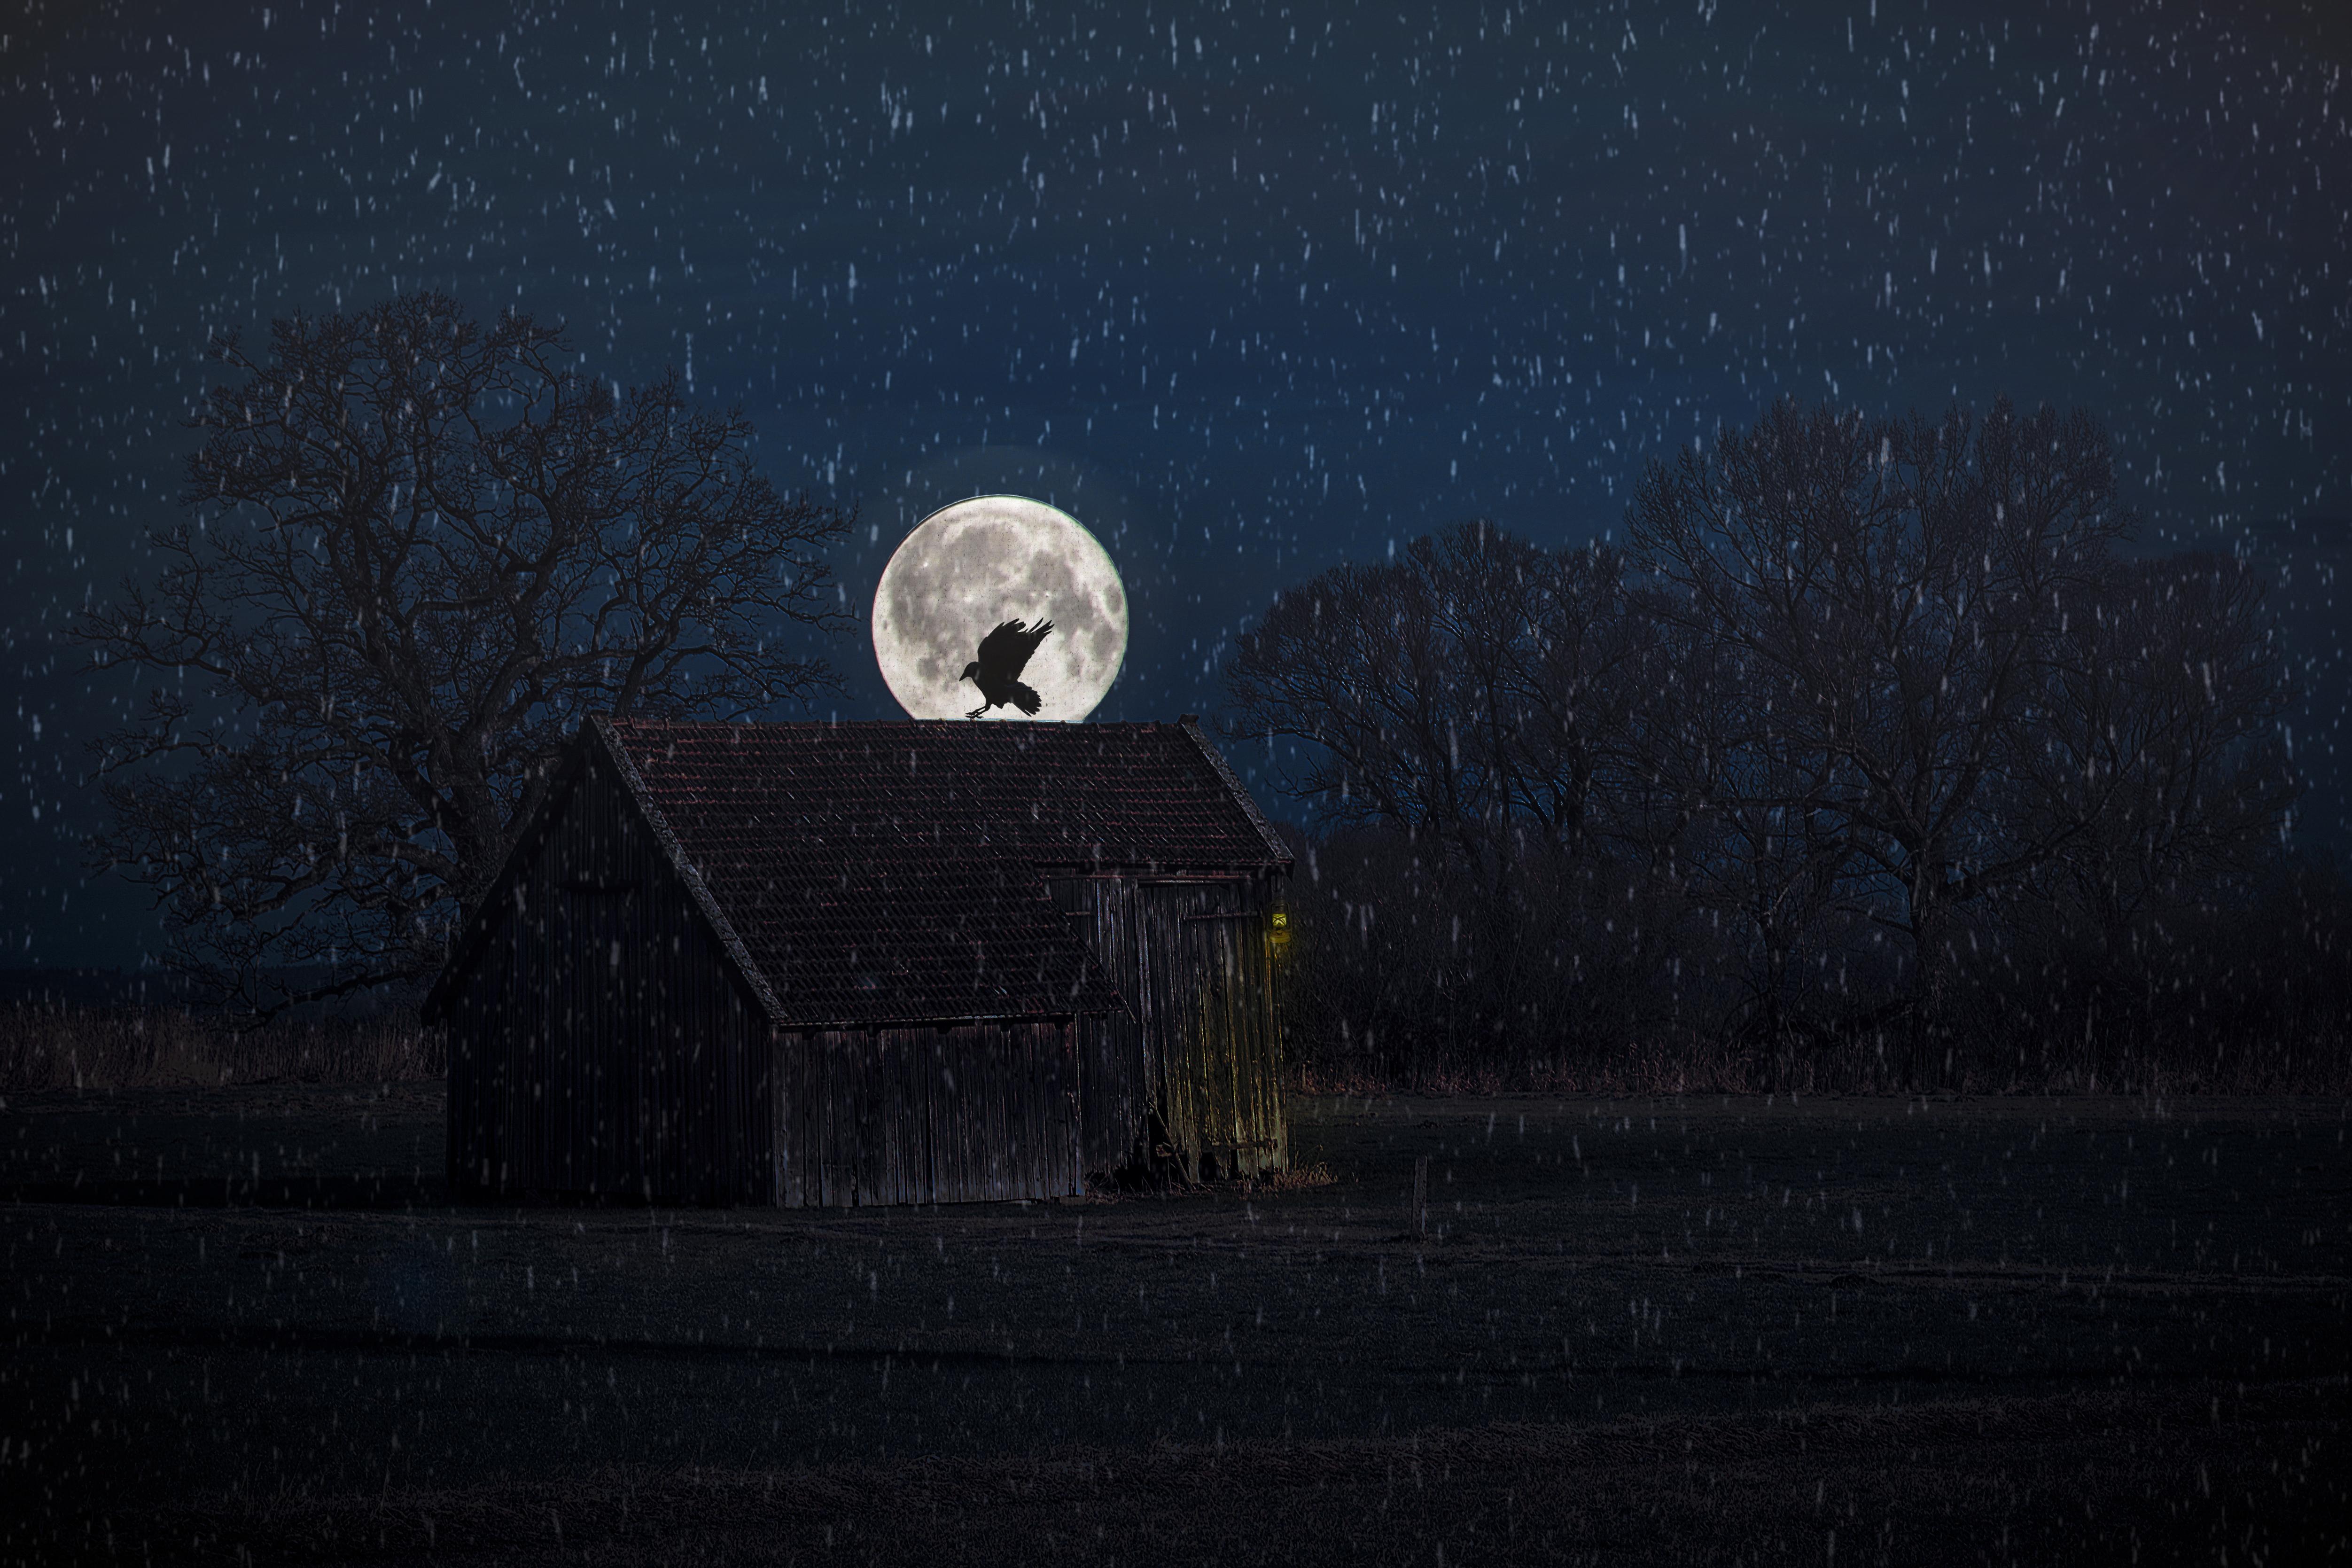 ночь дождь луна картинки дерева шкатулка